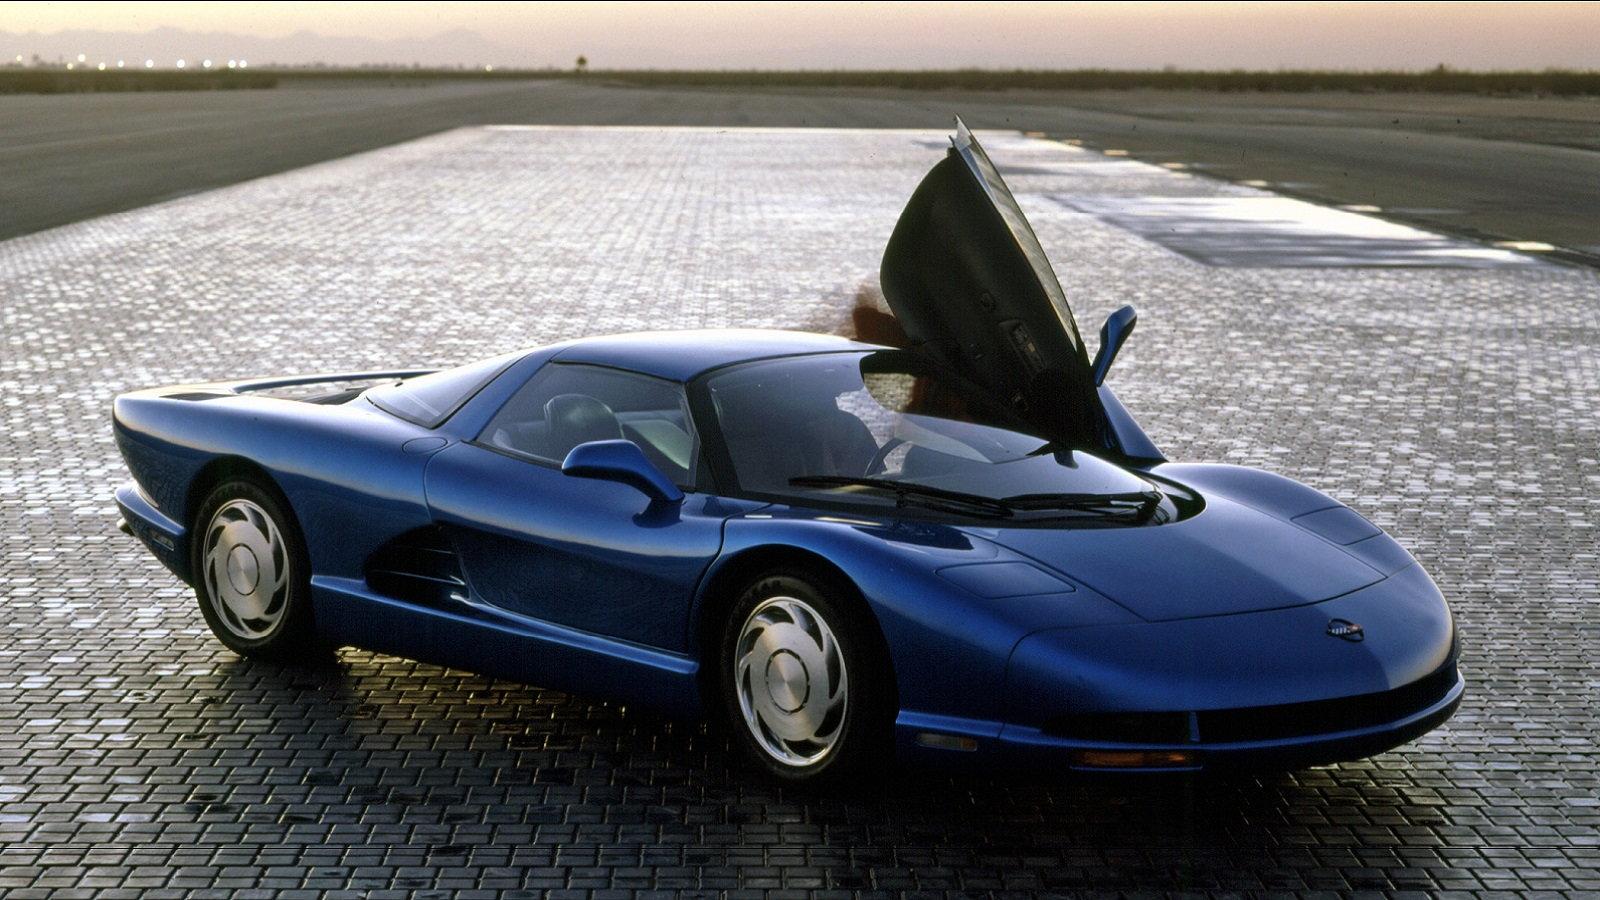 1990 CERV-III